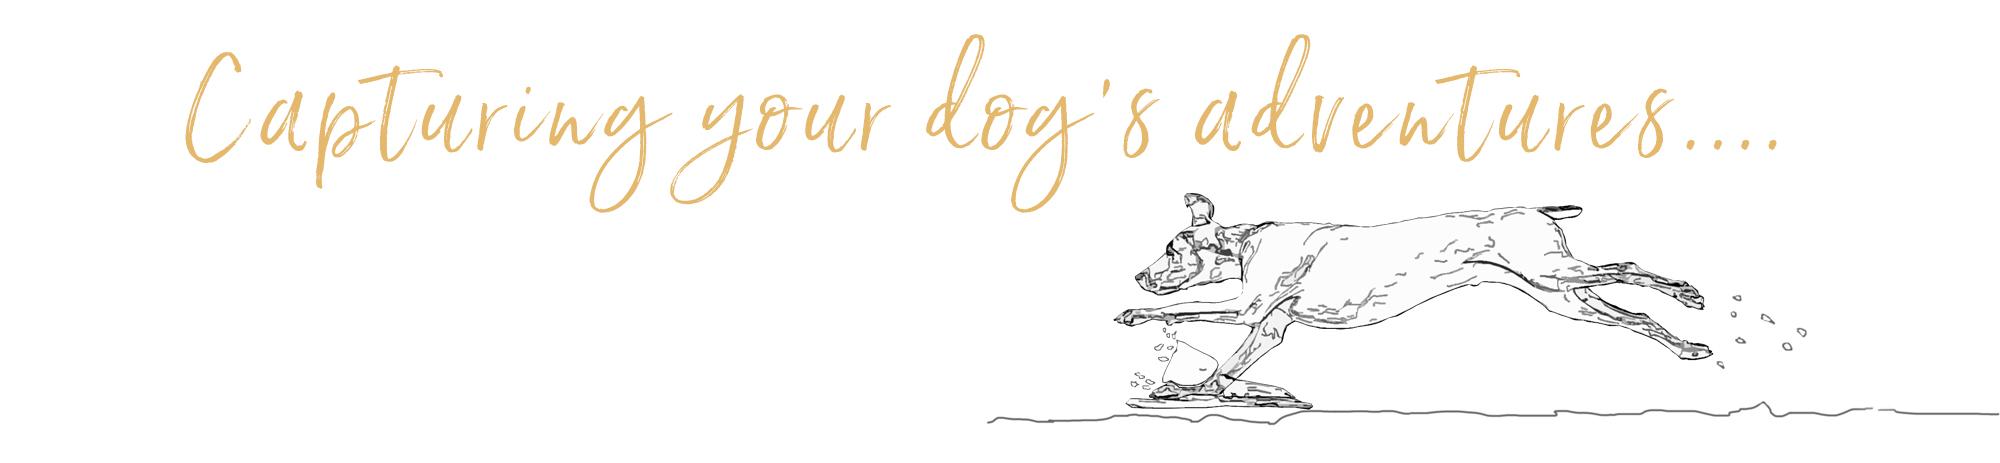 A Capturing your dog's adventure caption